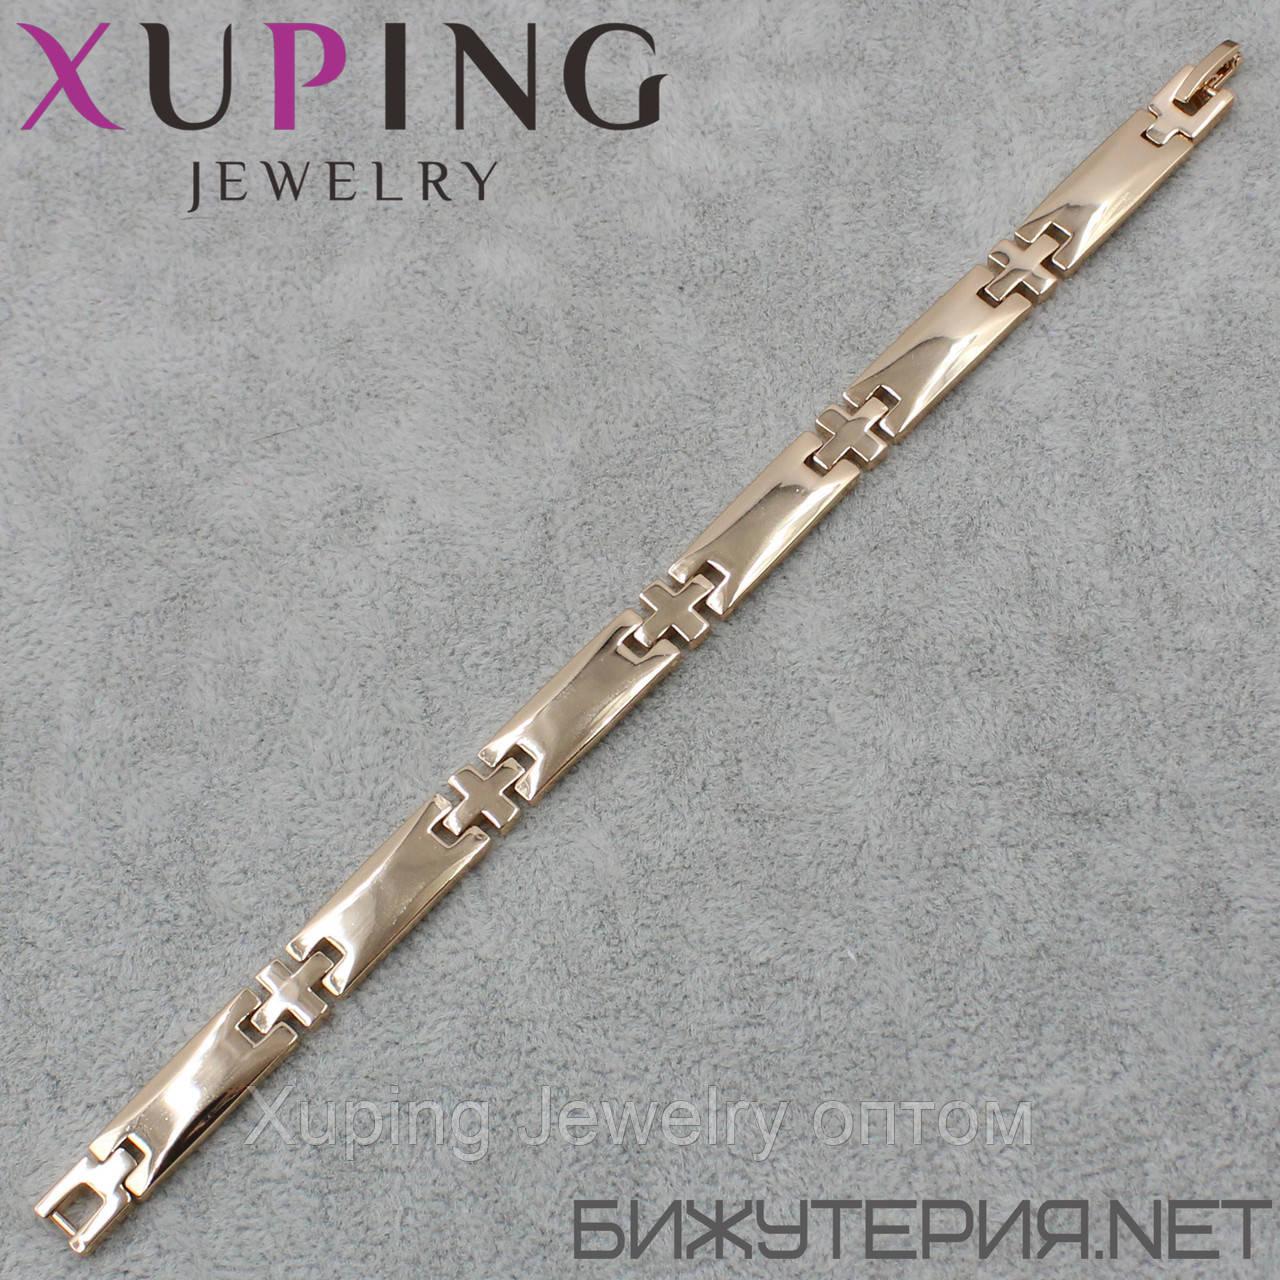 Браслет Xuping медицинское золото 18K Gold - 1023146294